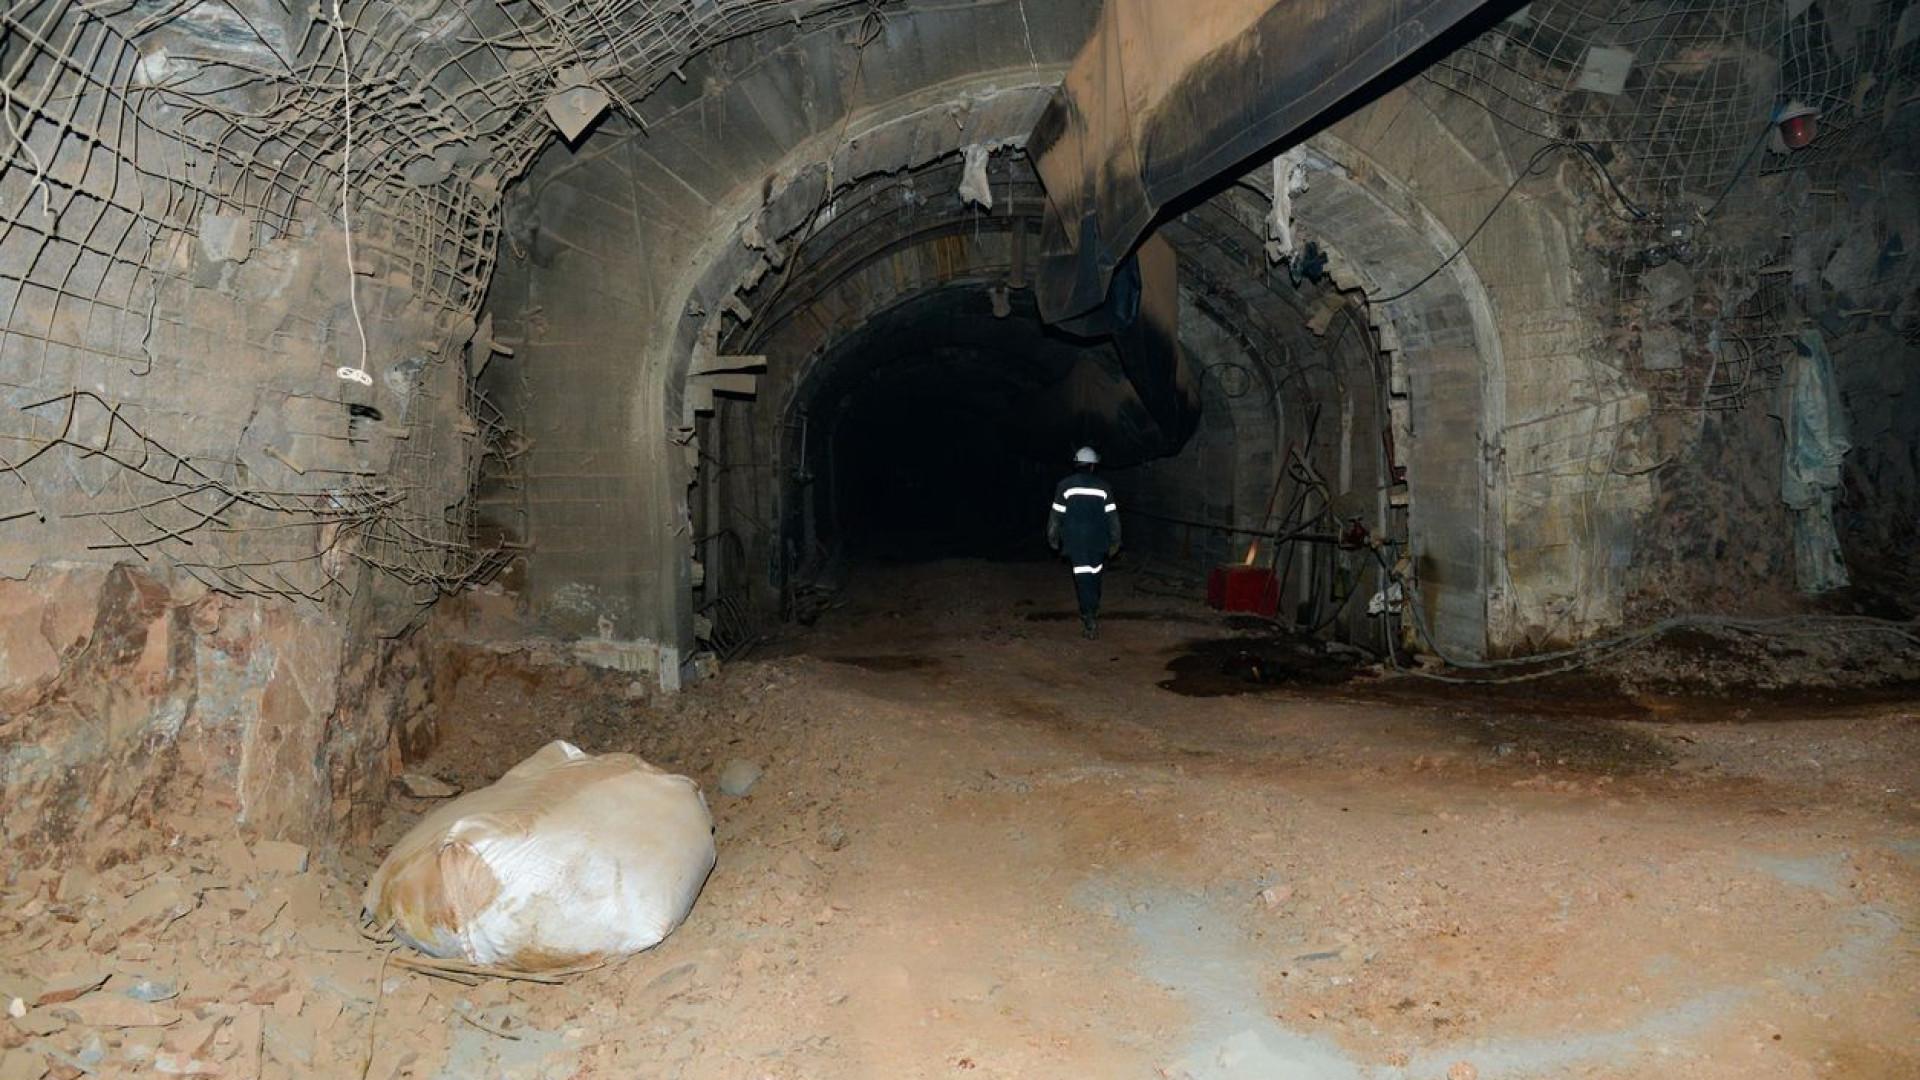 Deslizamento de terra em mina de Myanmar deixa ao menos 15 mortos